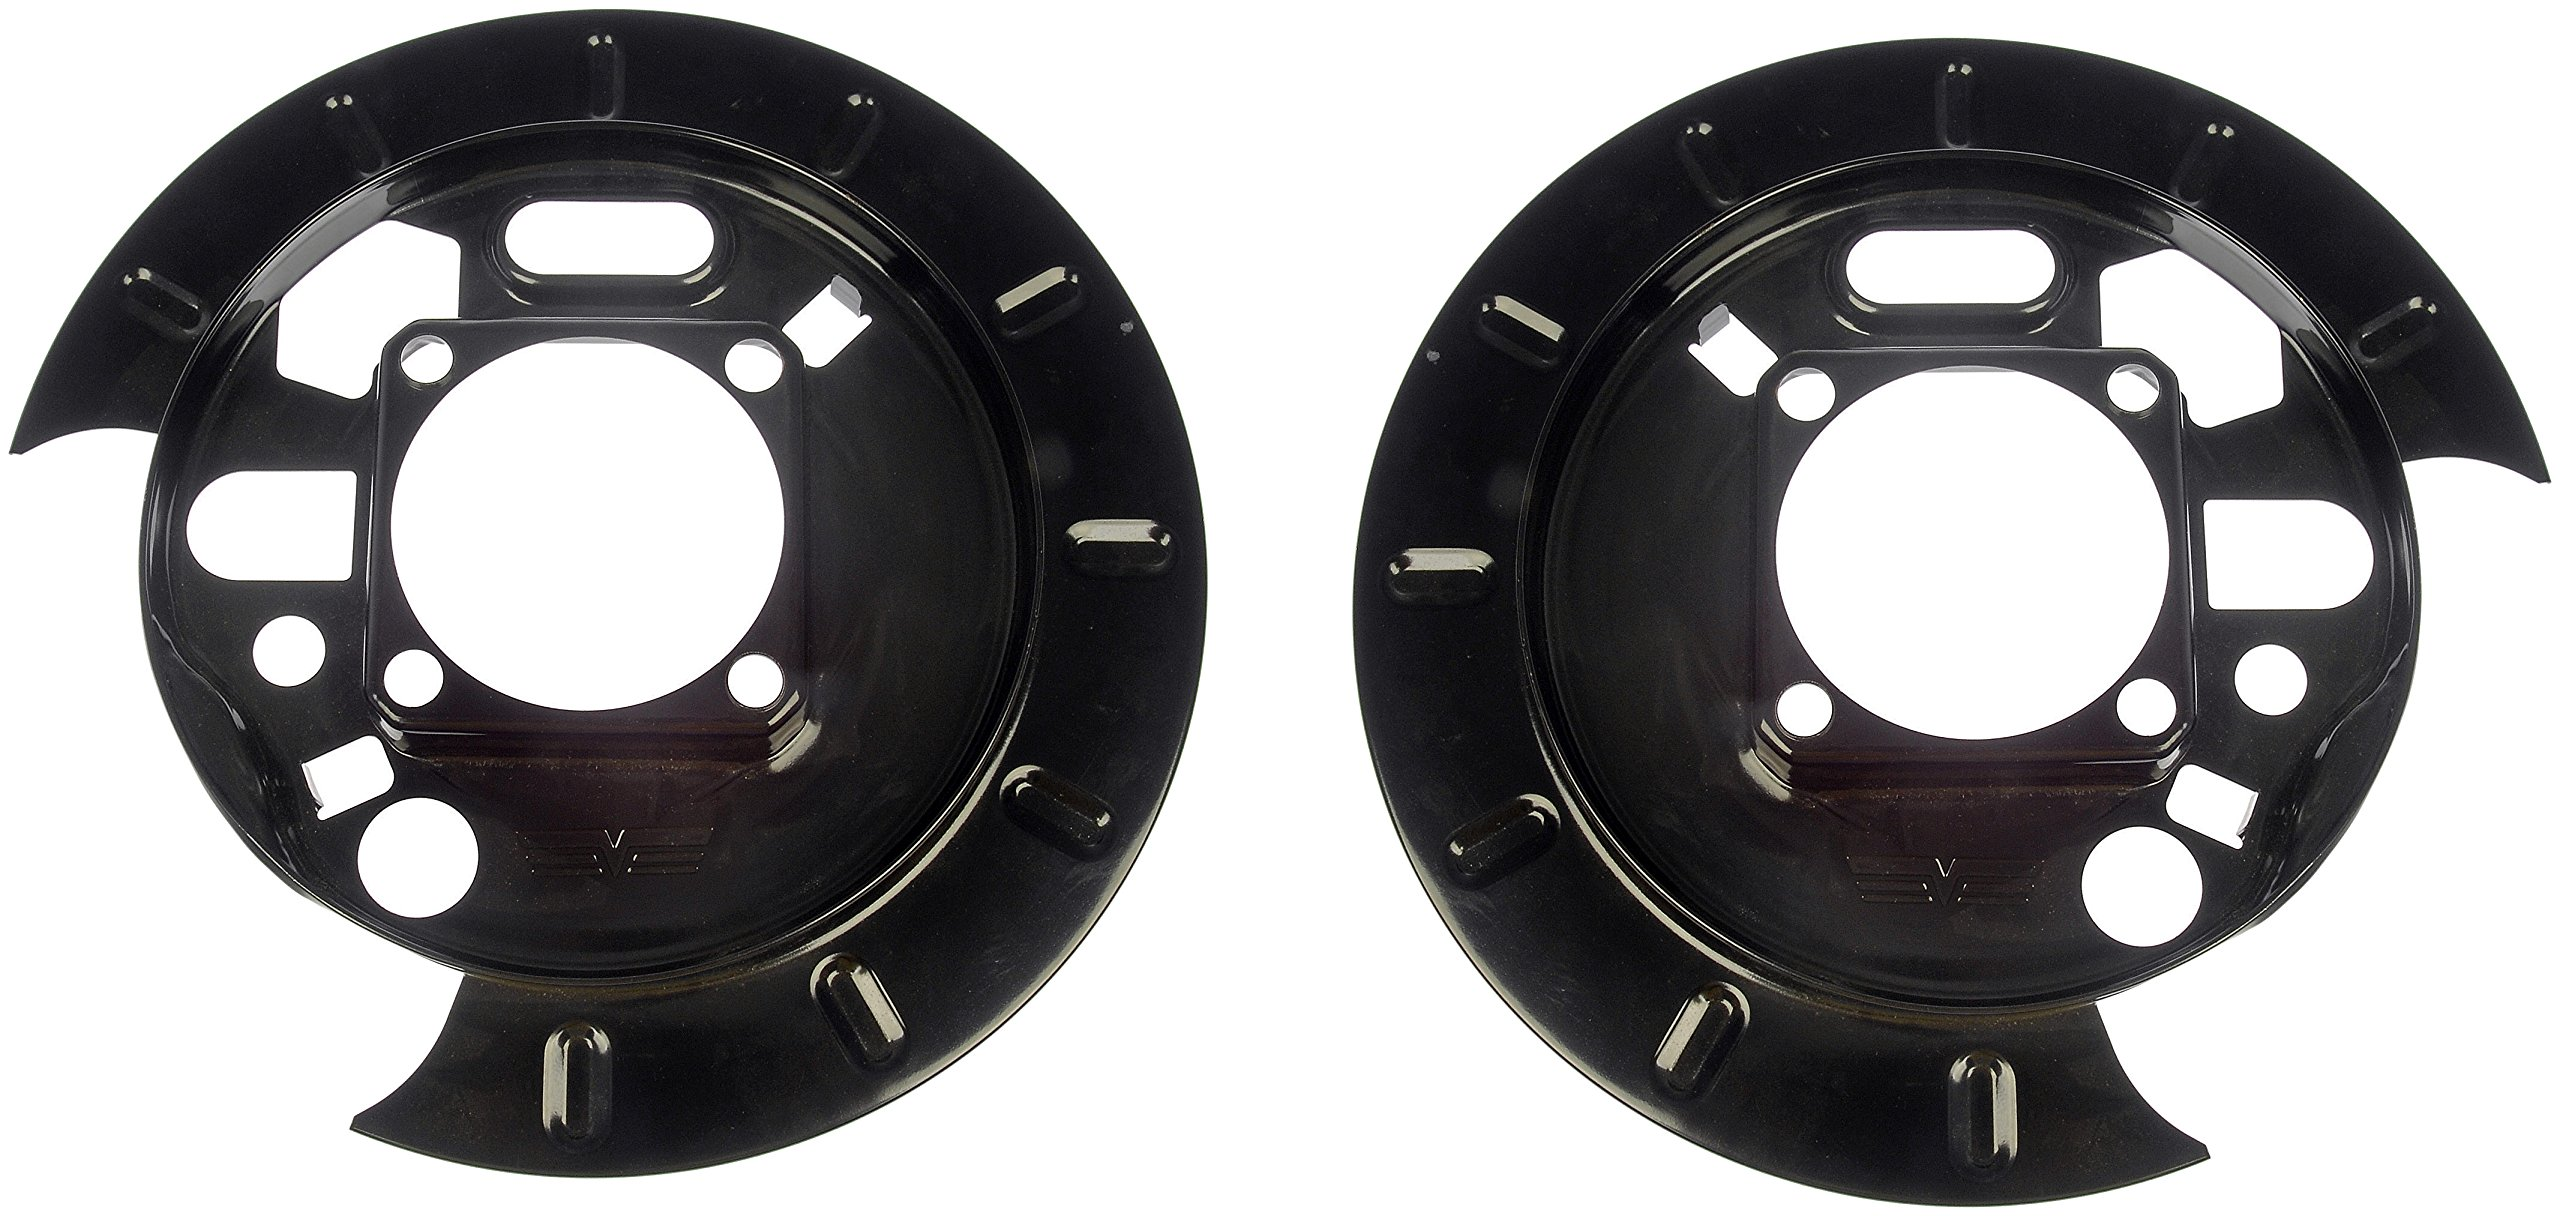 Dorman 924-208 Brake Dust Shield, Pair